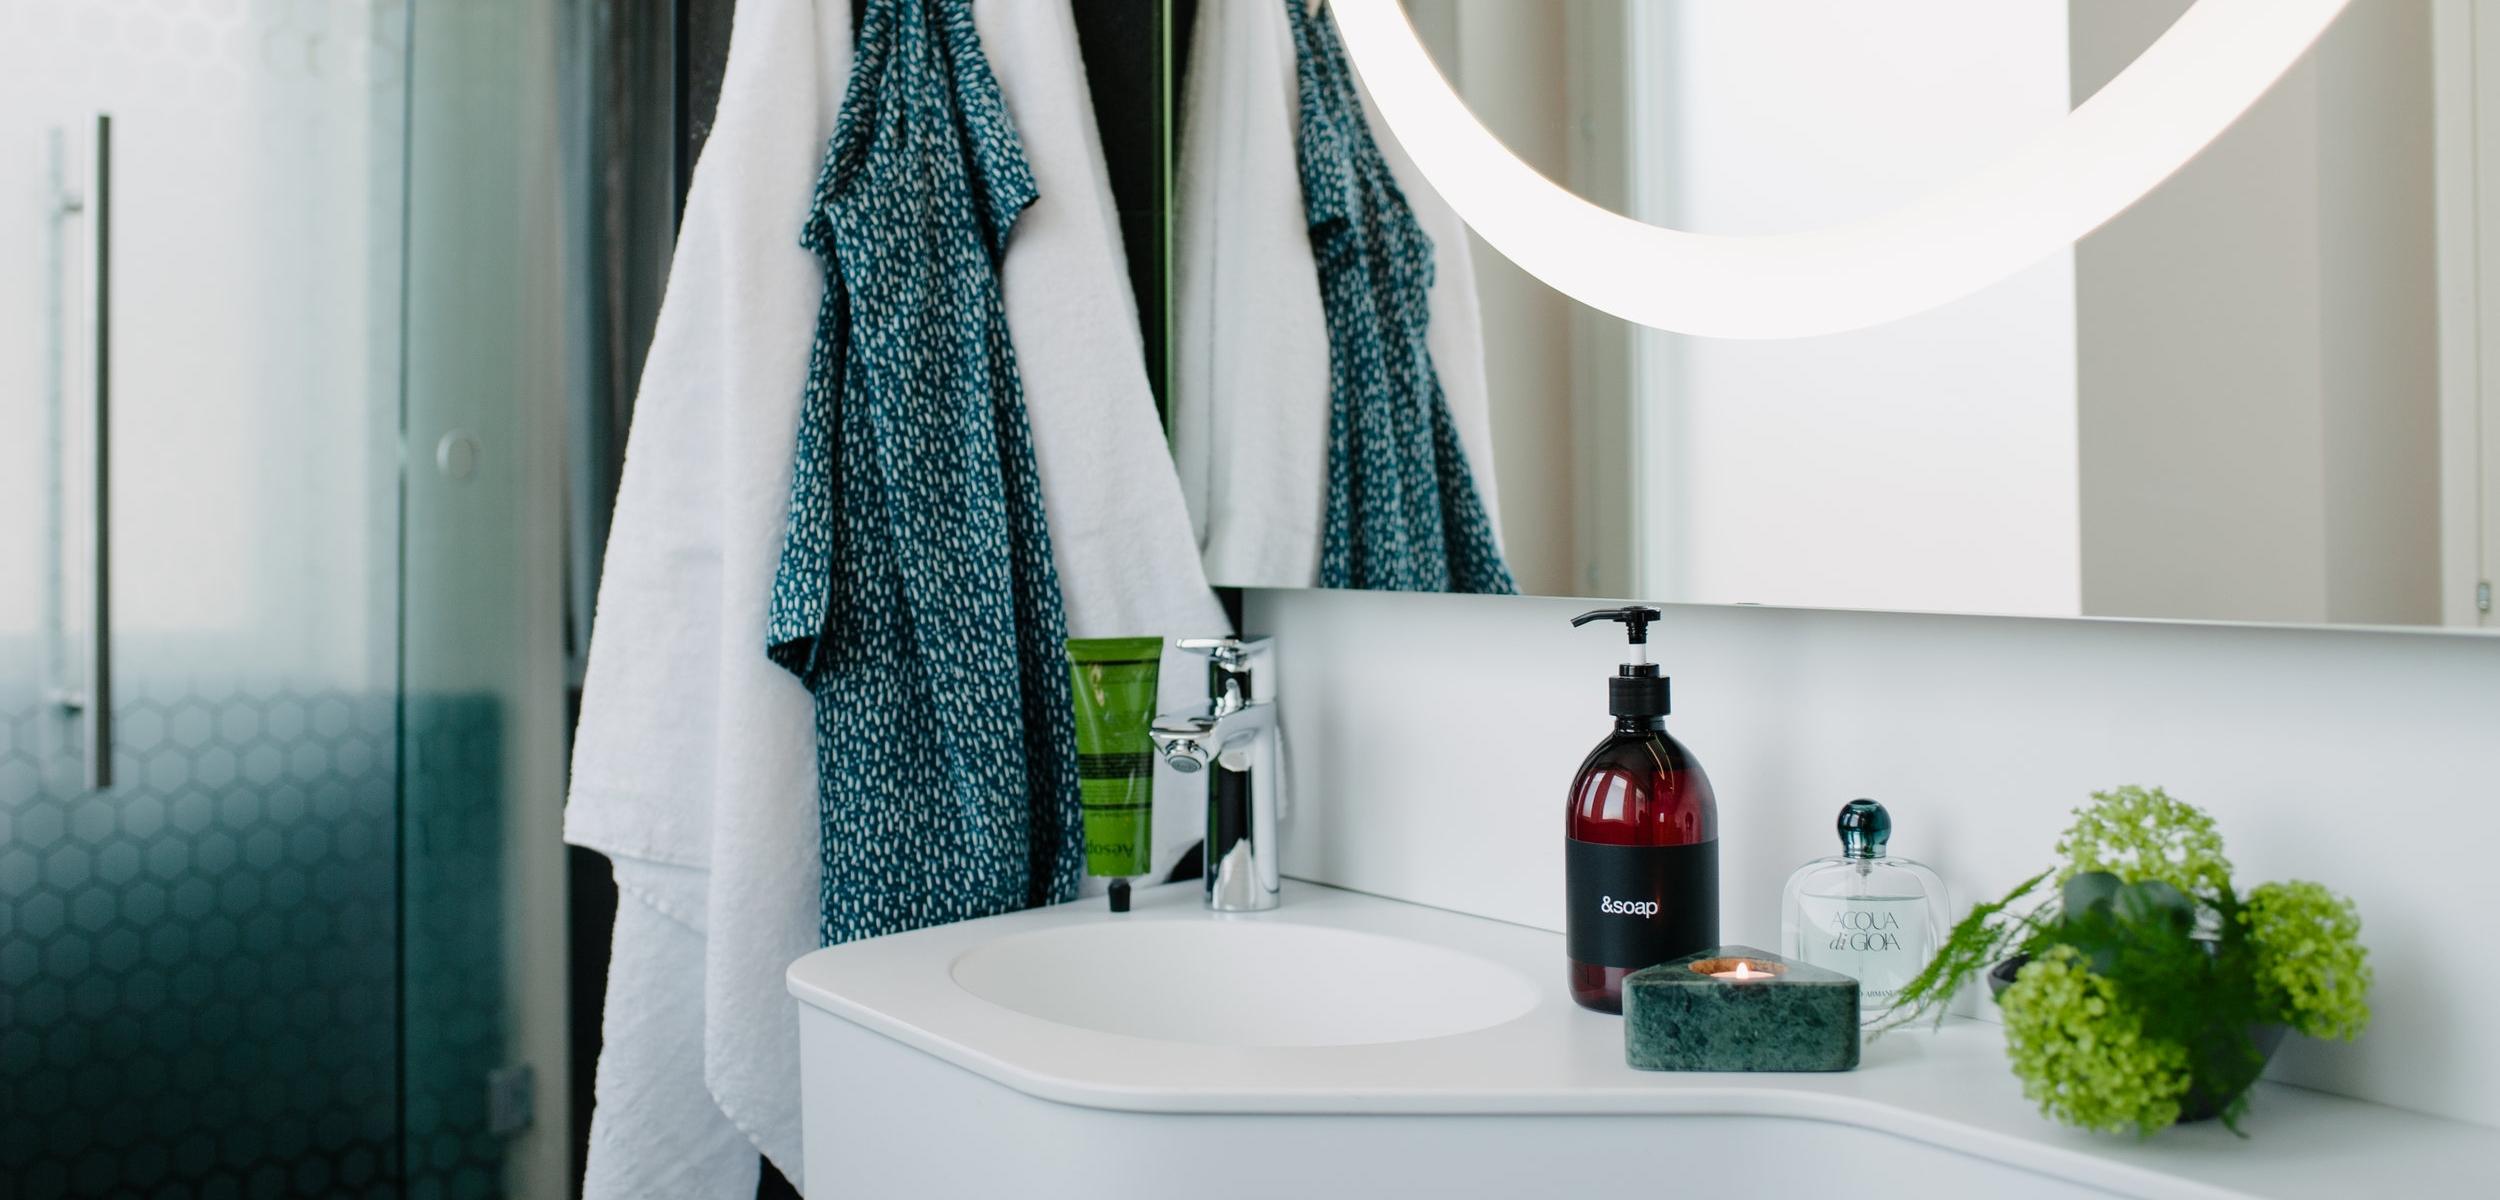 Bathroom_mirror_4.jpg